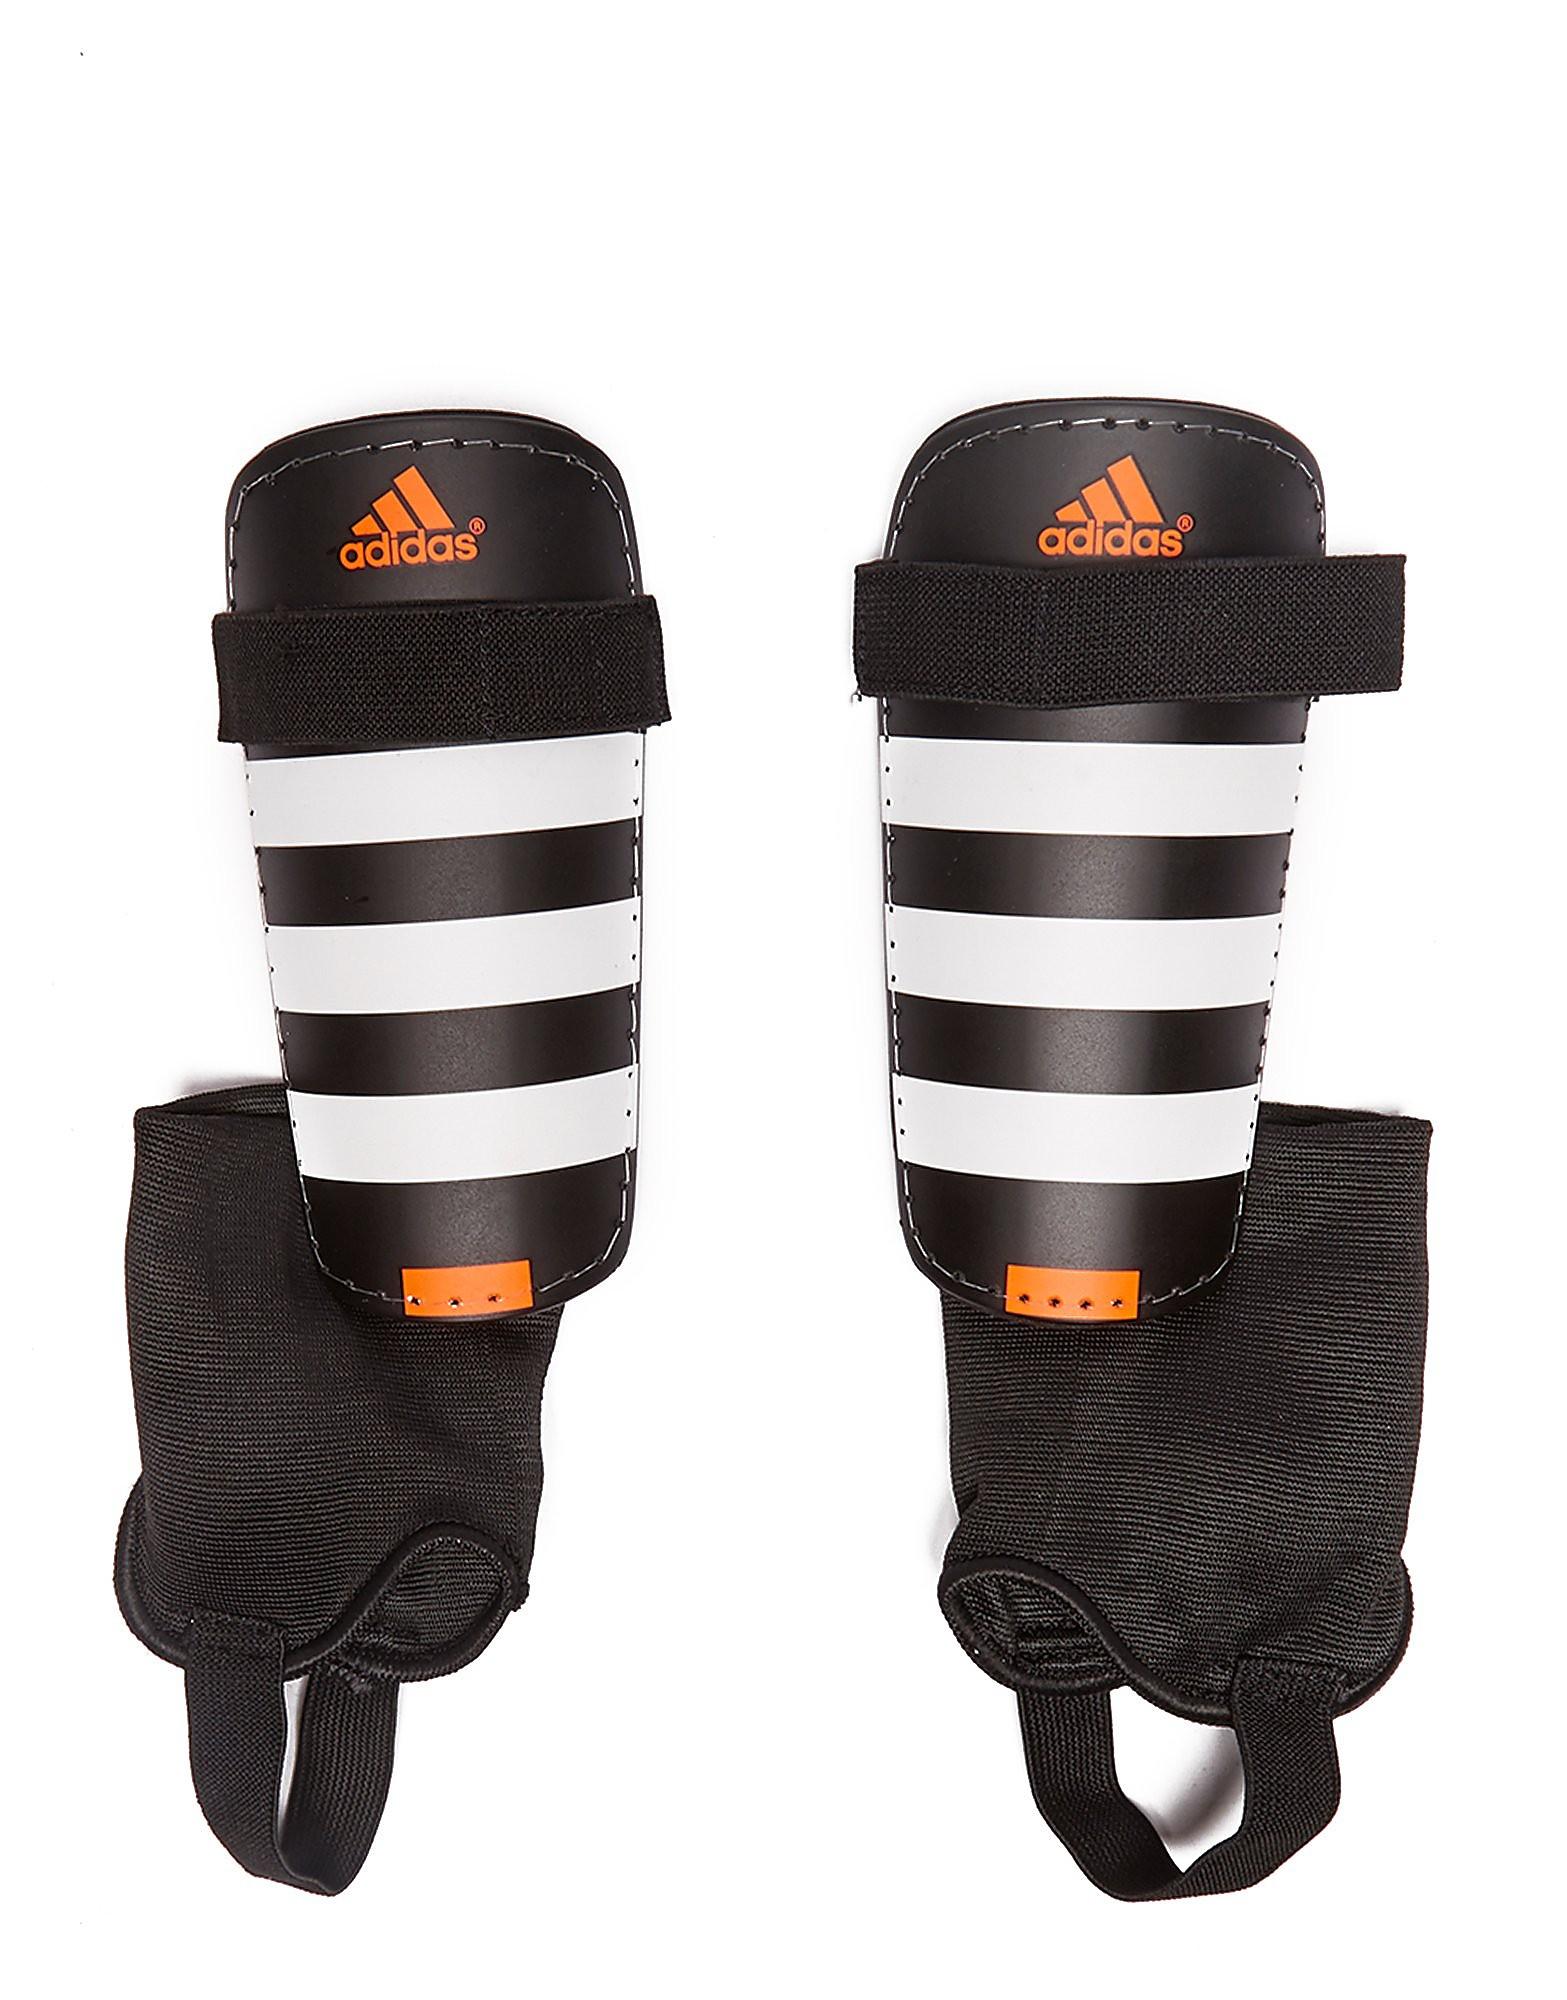 adidas Everclub benskinner